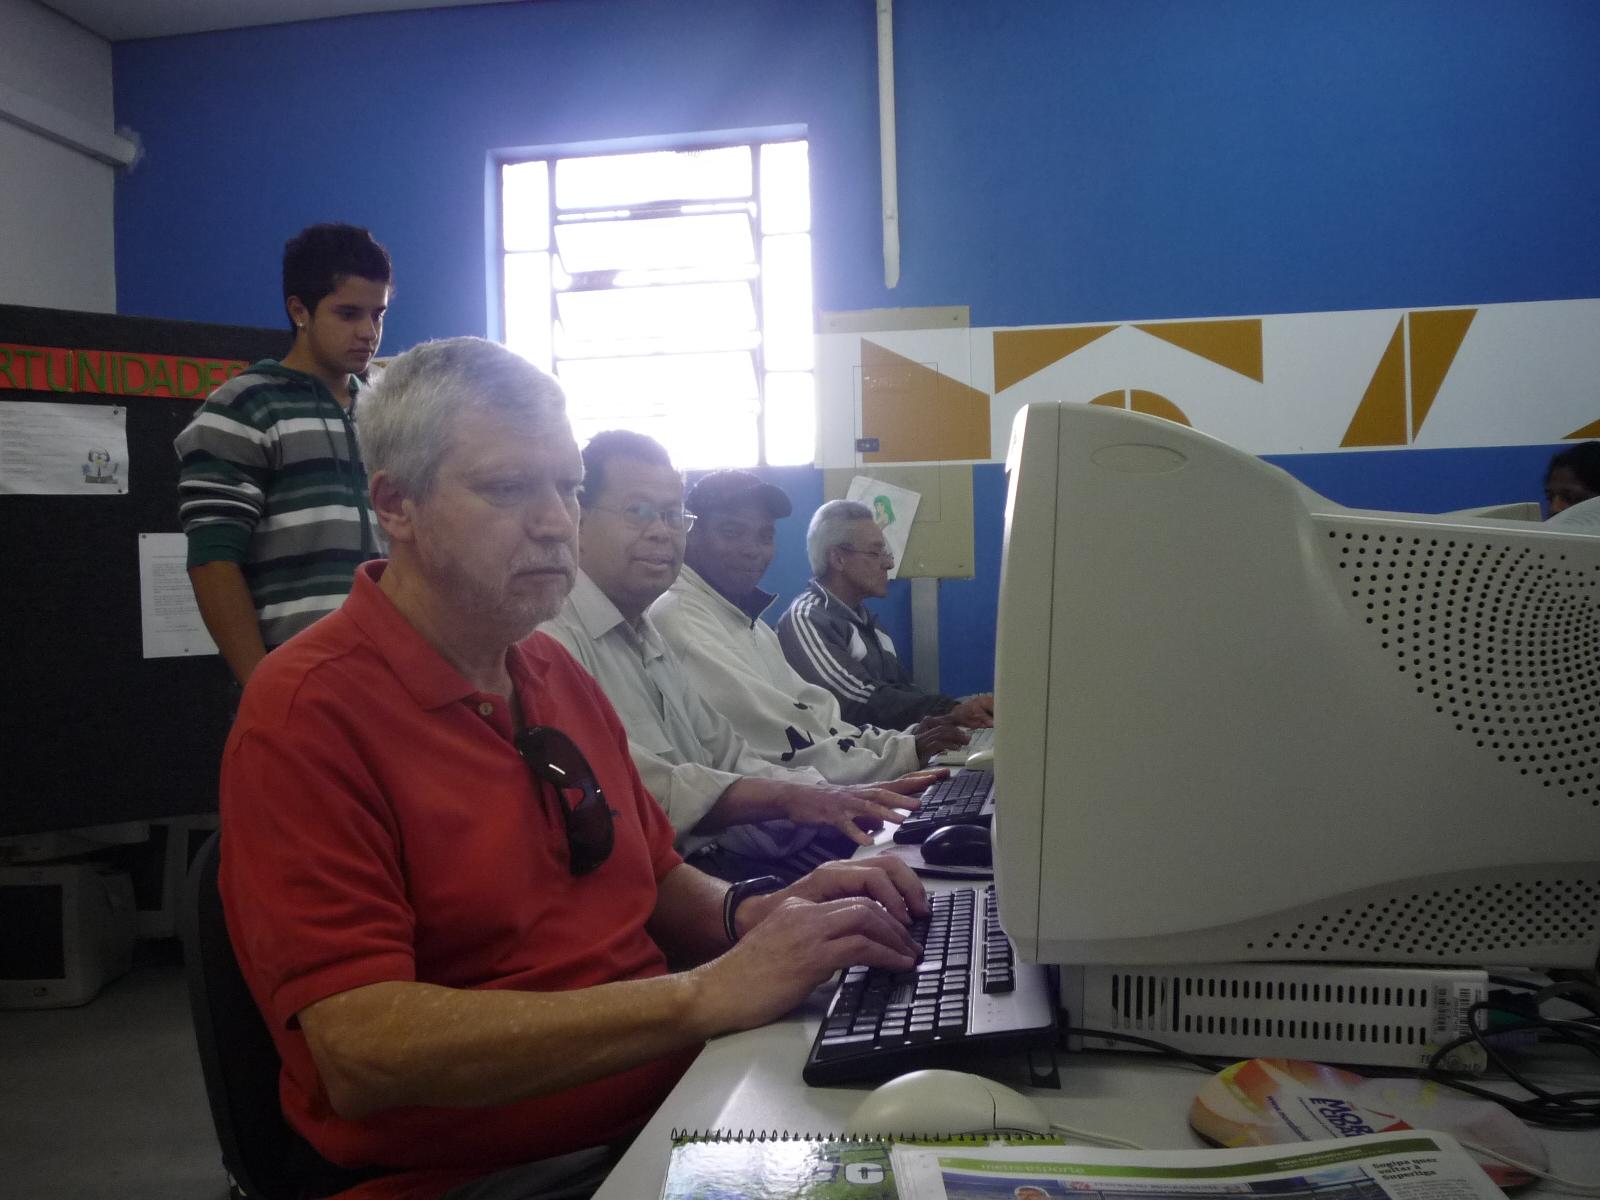 Curso de informatica porto alegre